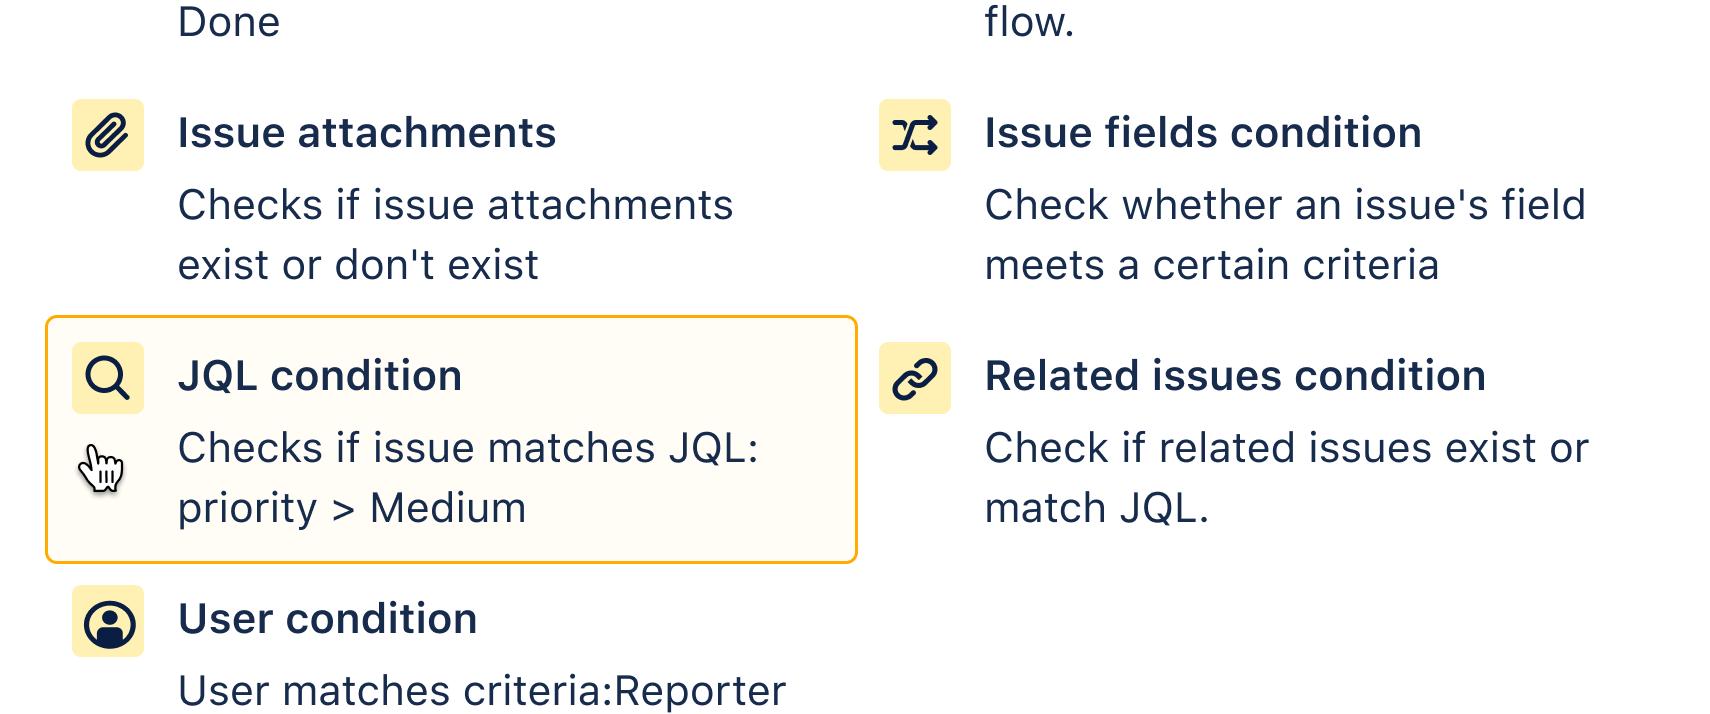 Adding JQL condition